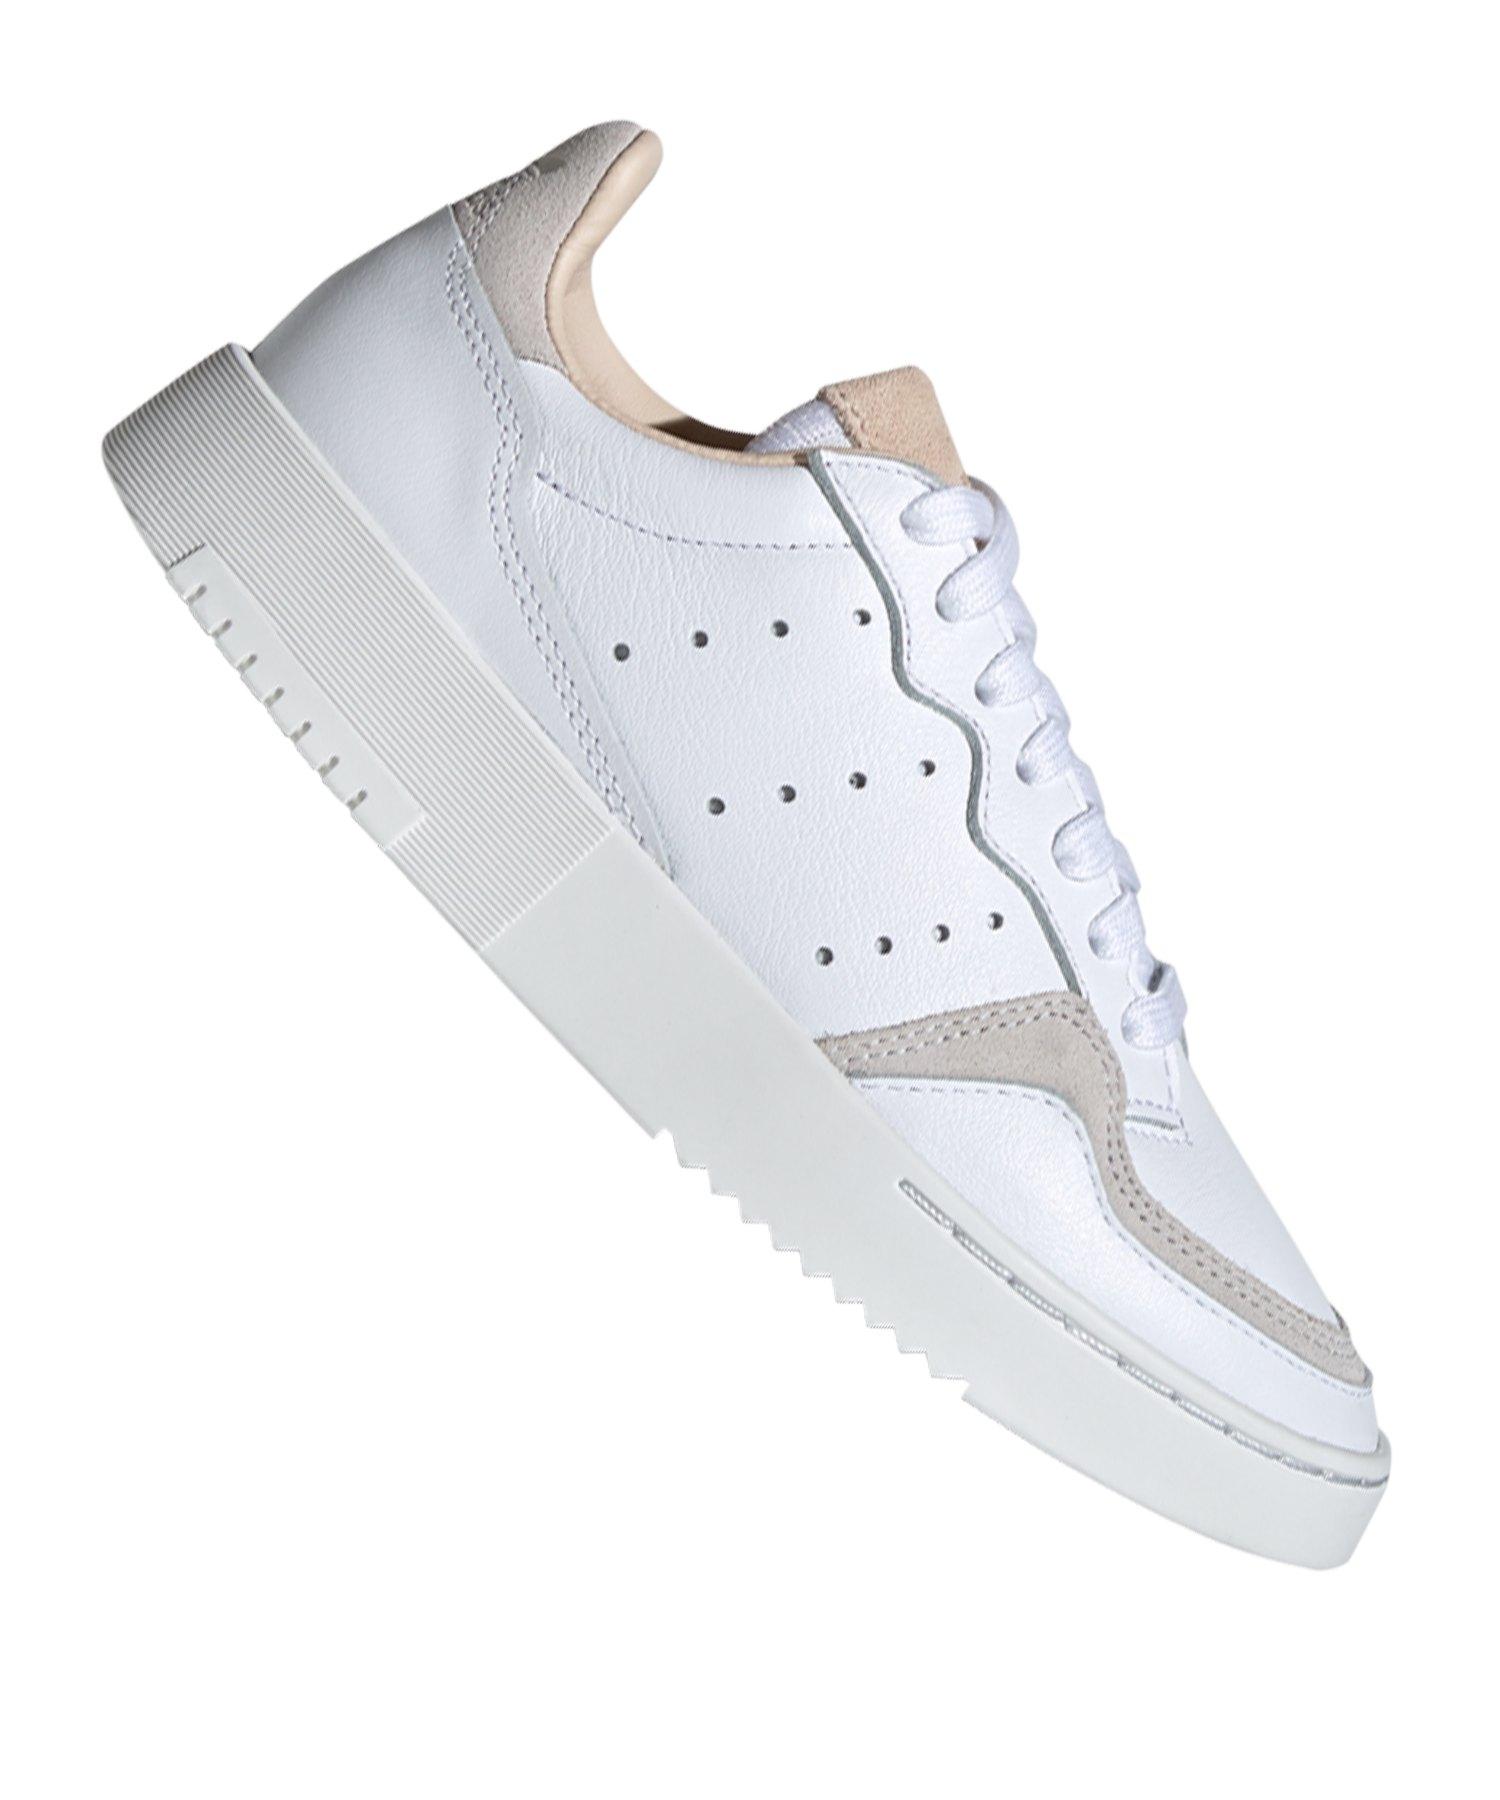 adidas turnschuhe weiß kinder